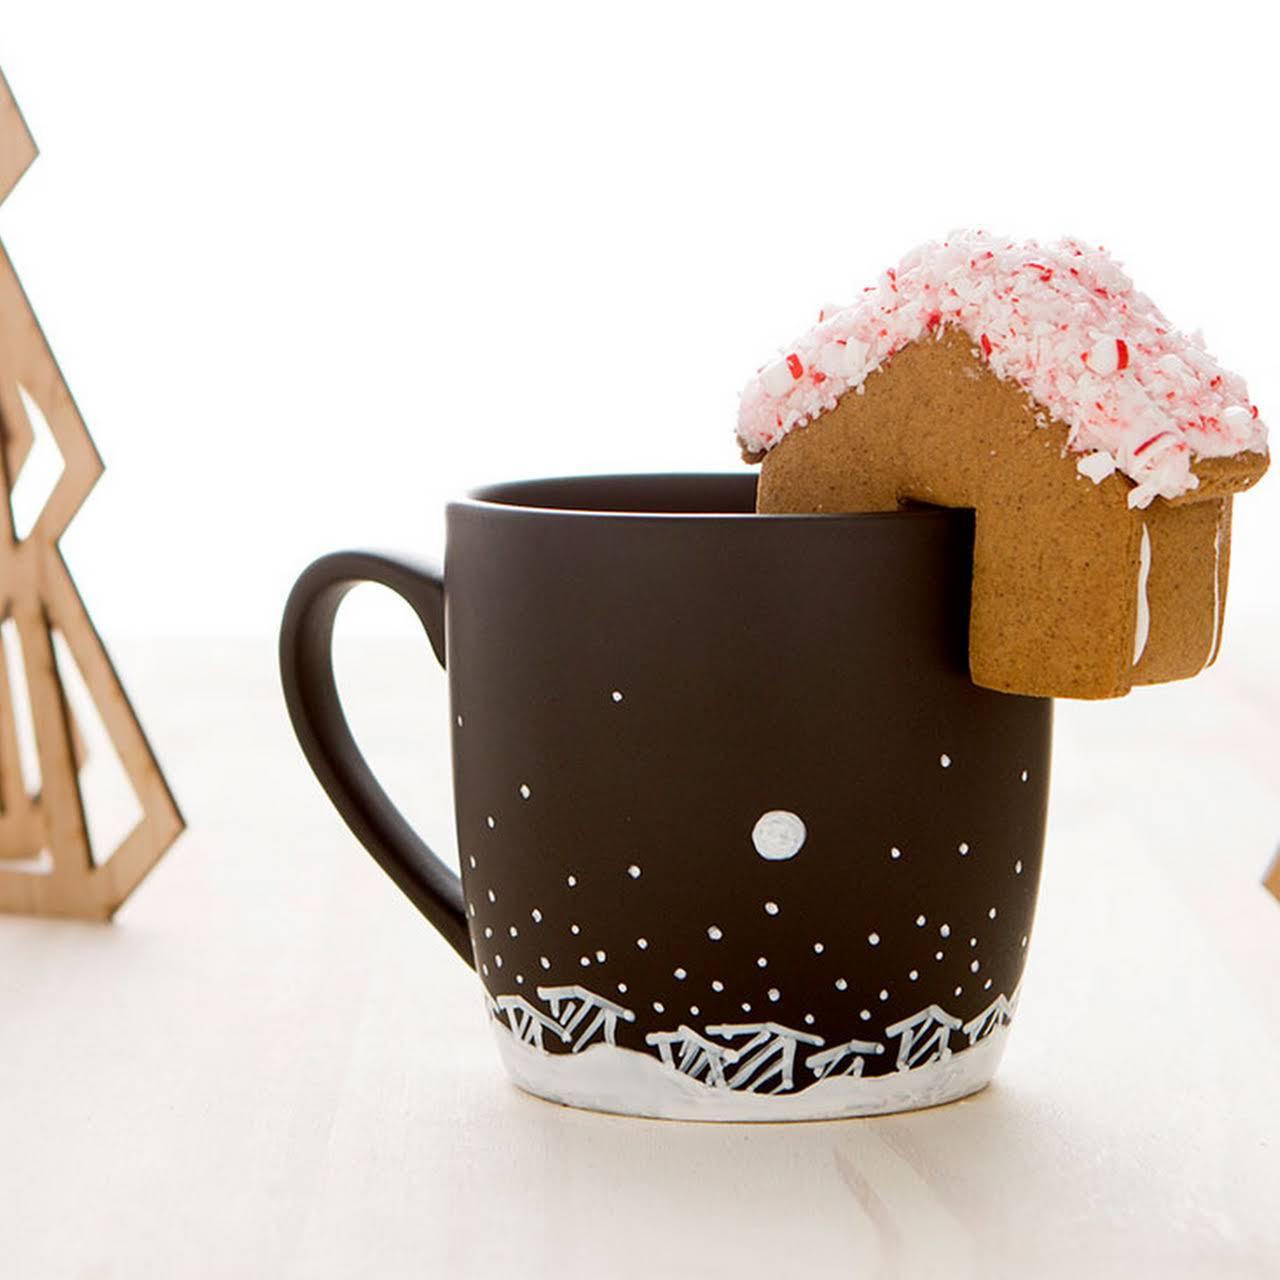 Holiday Mug and Mini Gingerbread House Kit!